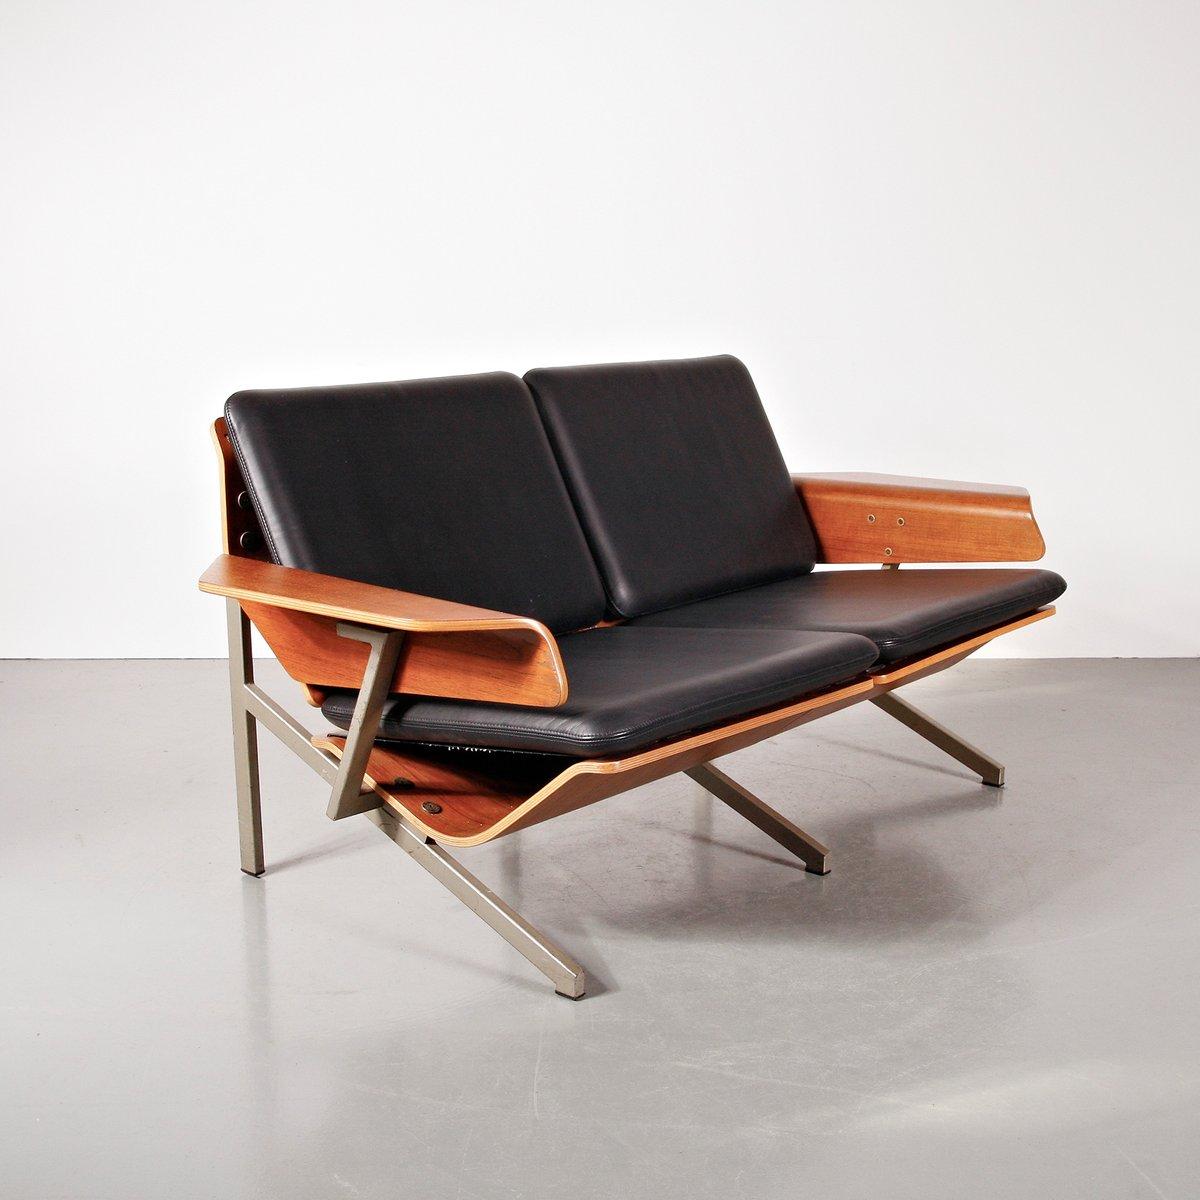 2 Seater Leather Sofa By Cornelis Zitman 1964